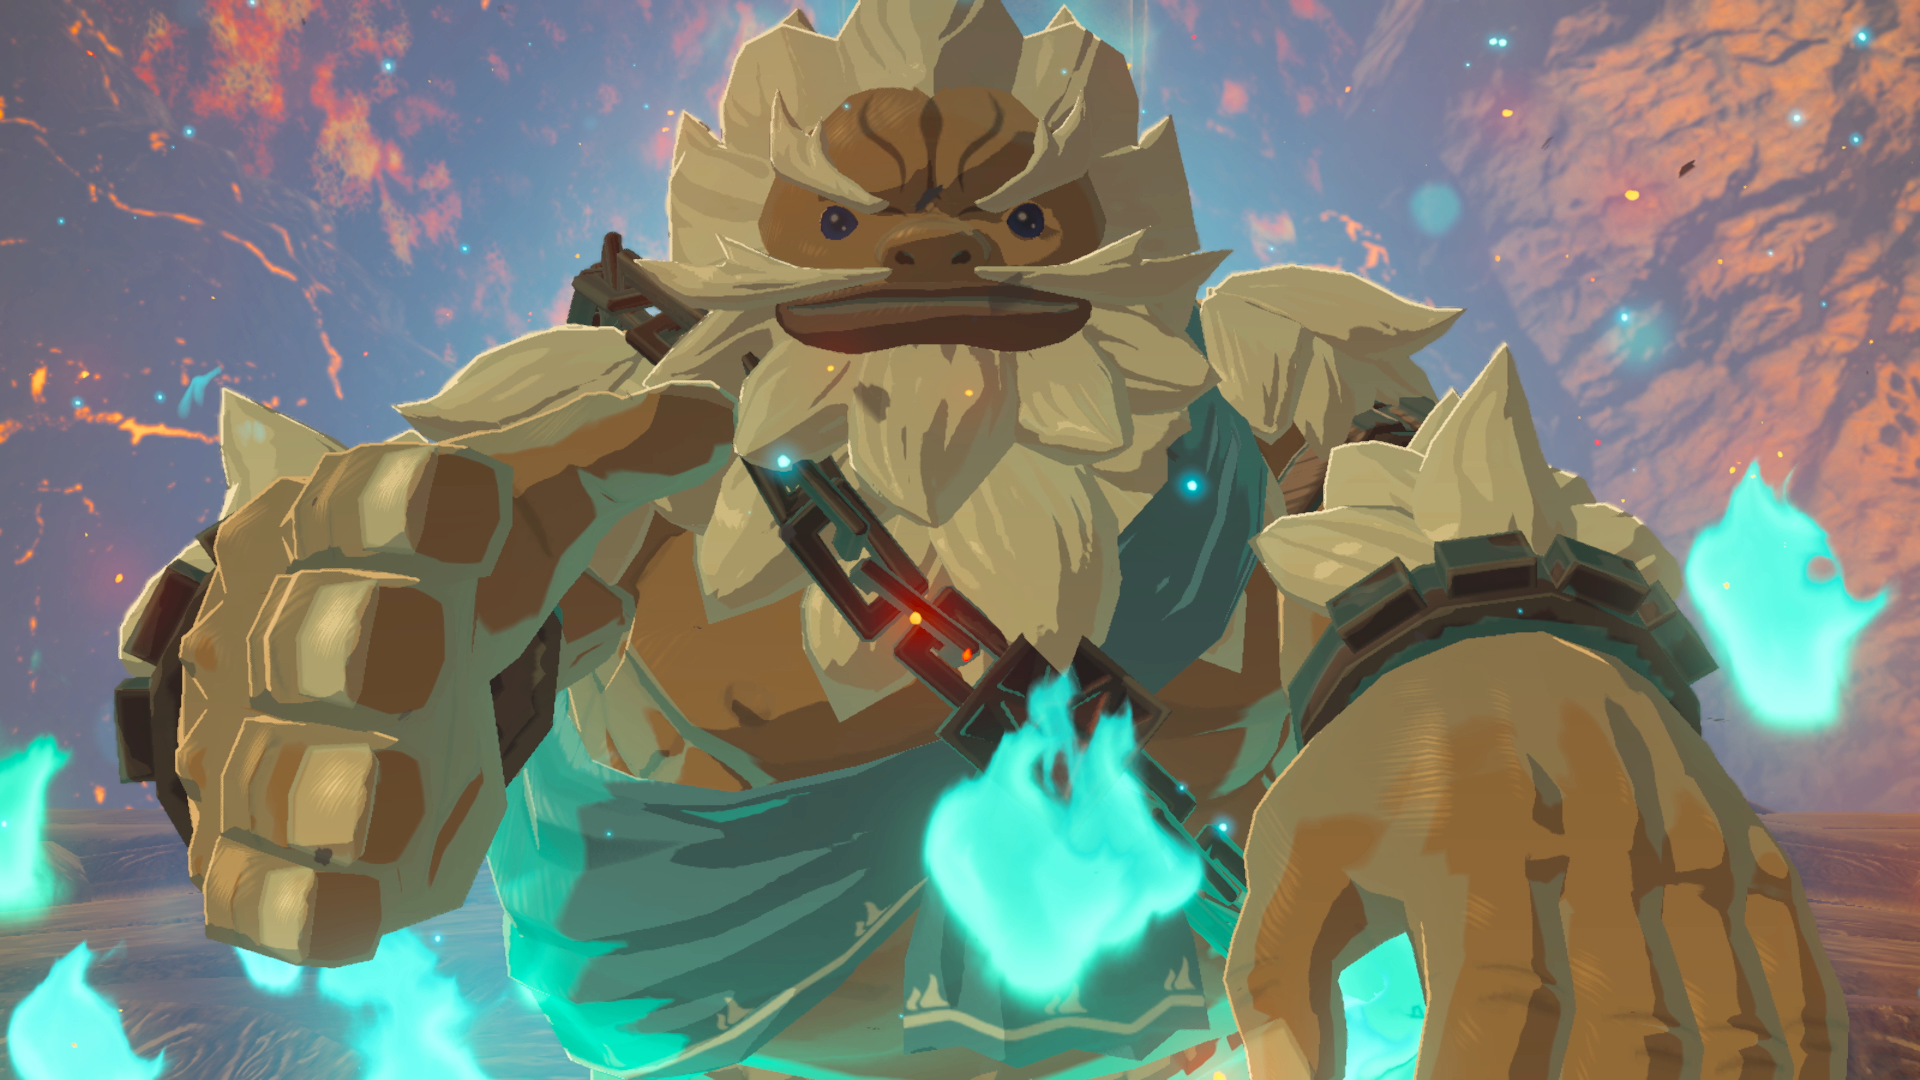 The Legend of Zelda: Breath of the Wild image 9